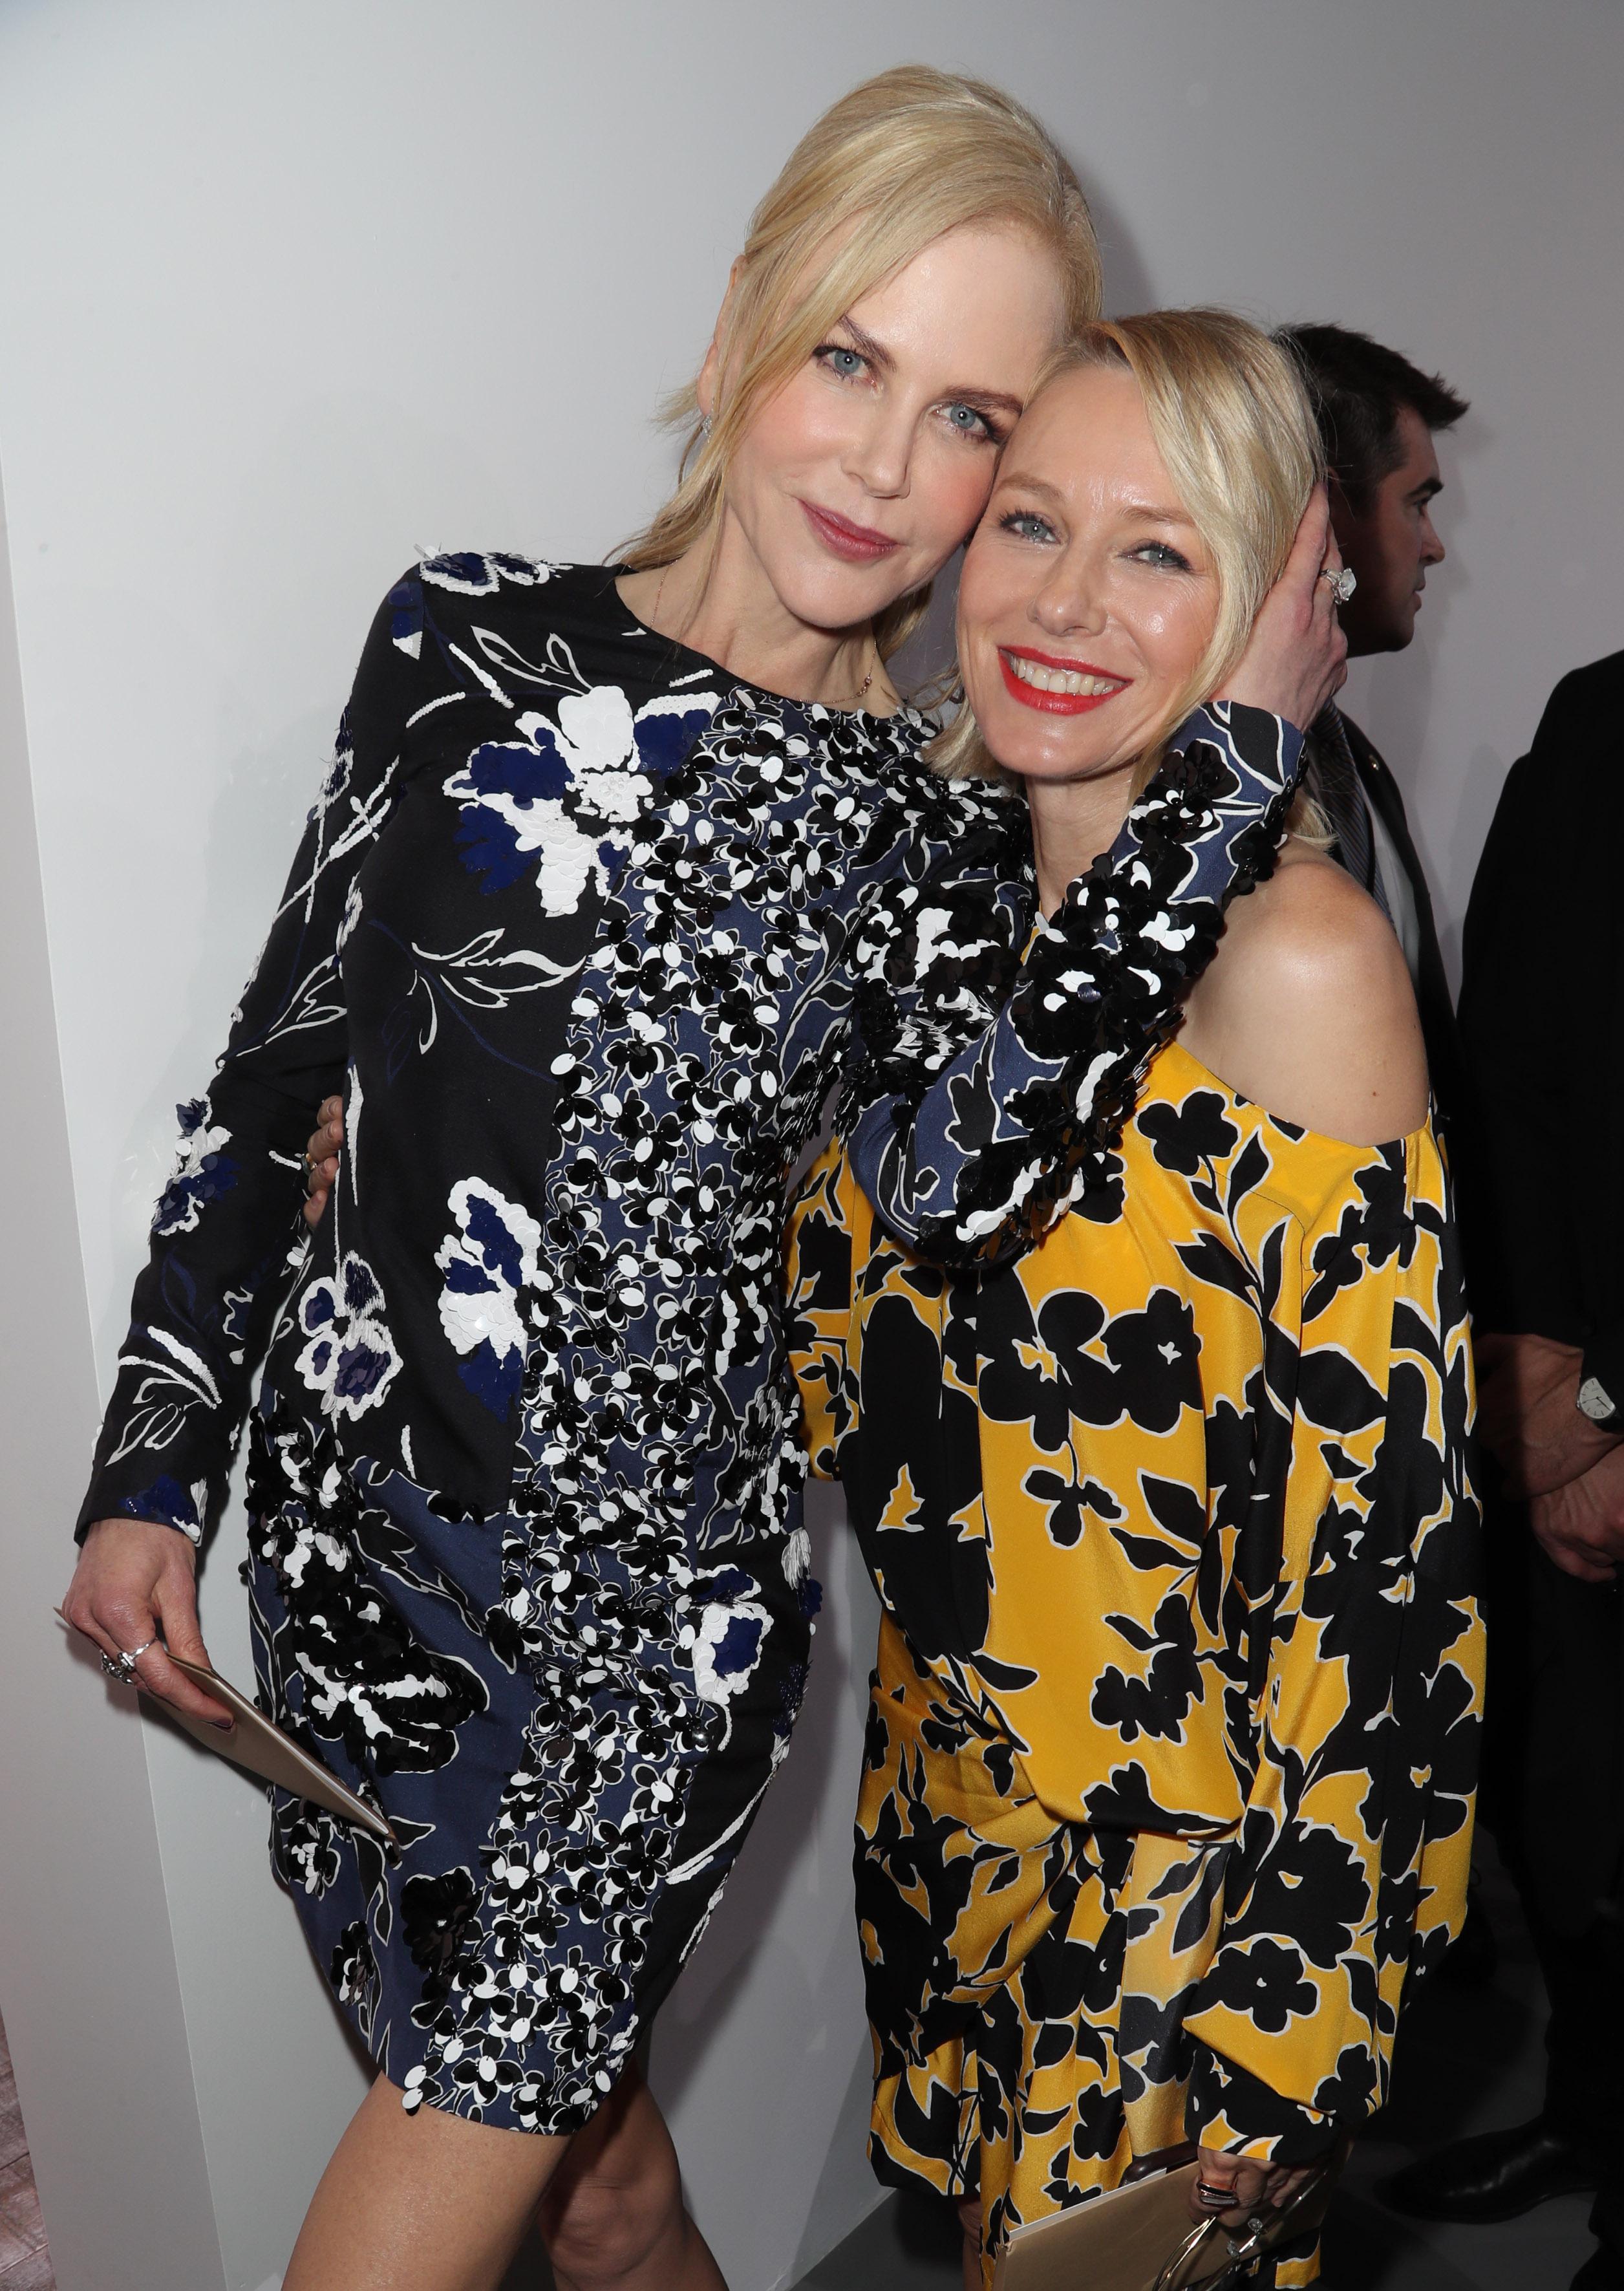 Nicole Kidman and Naomi WattsMichael Kors show, Front Row, Spring Summer 2018, New York Fashion Week, USA - 13 Sep 2017